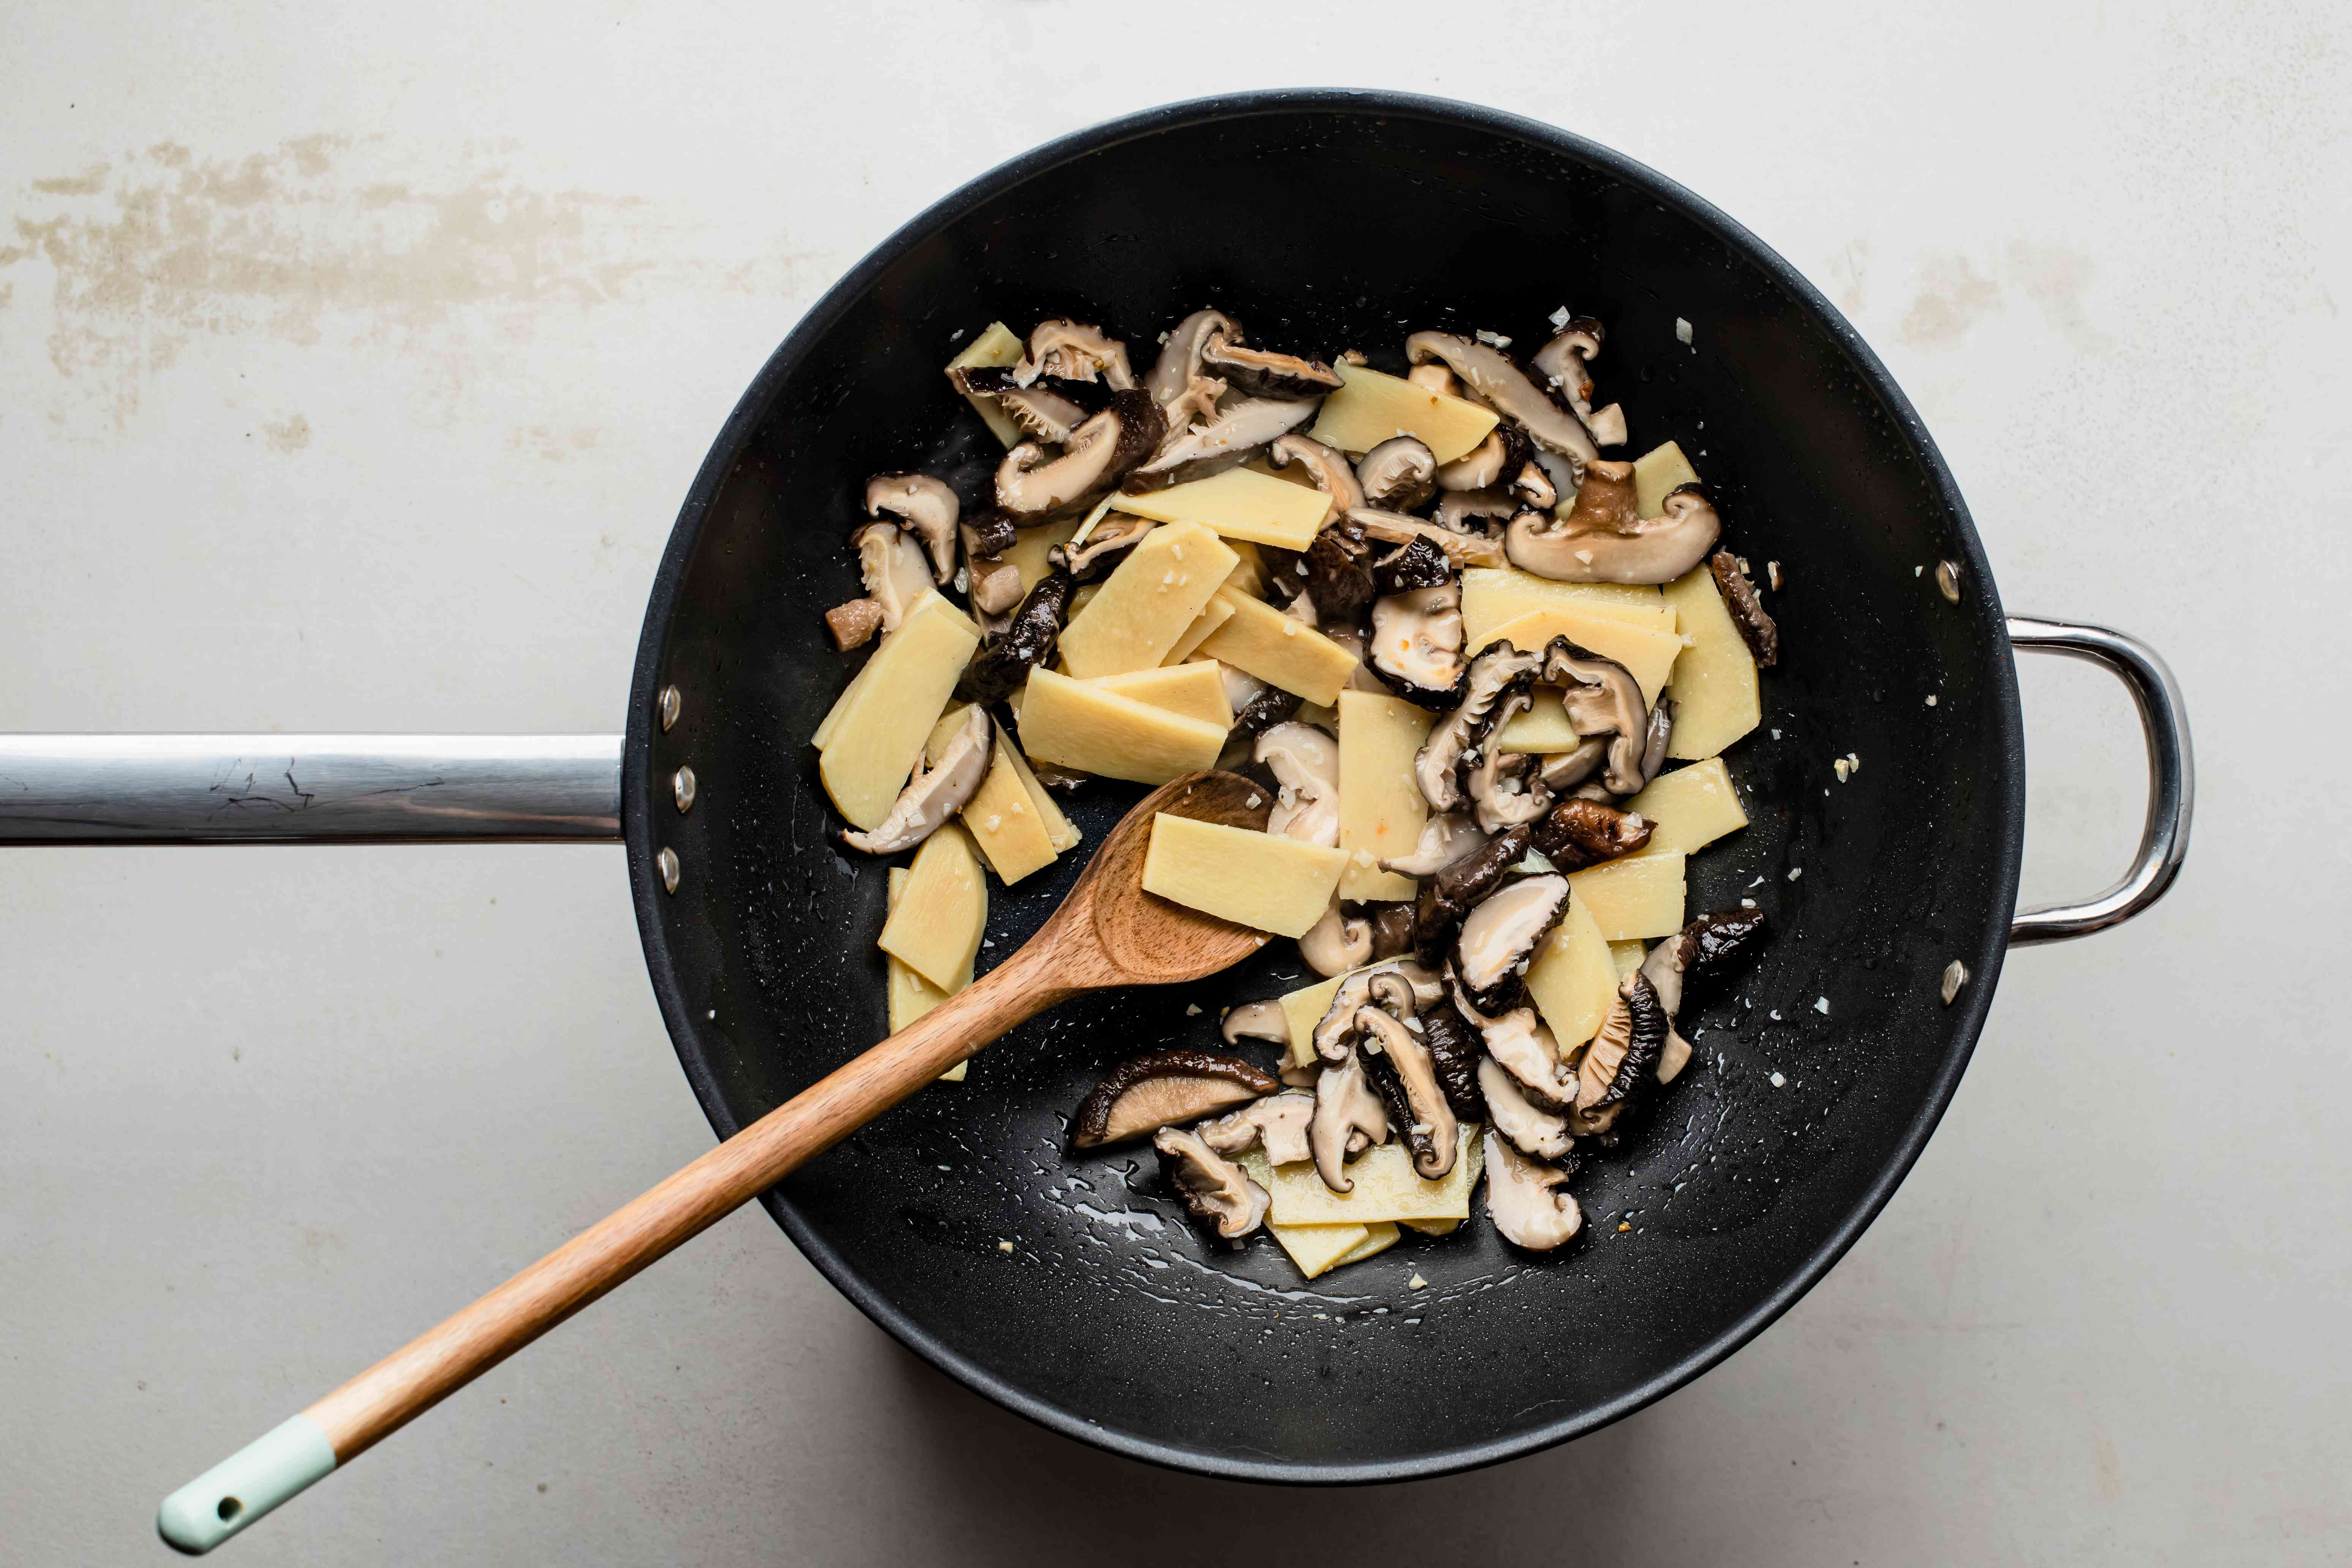 Add bamboo and mushrooms